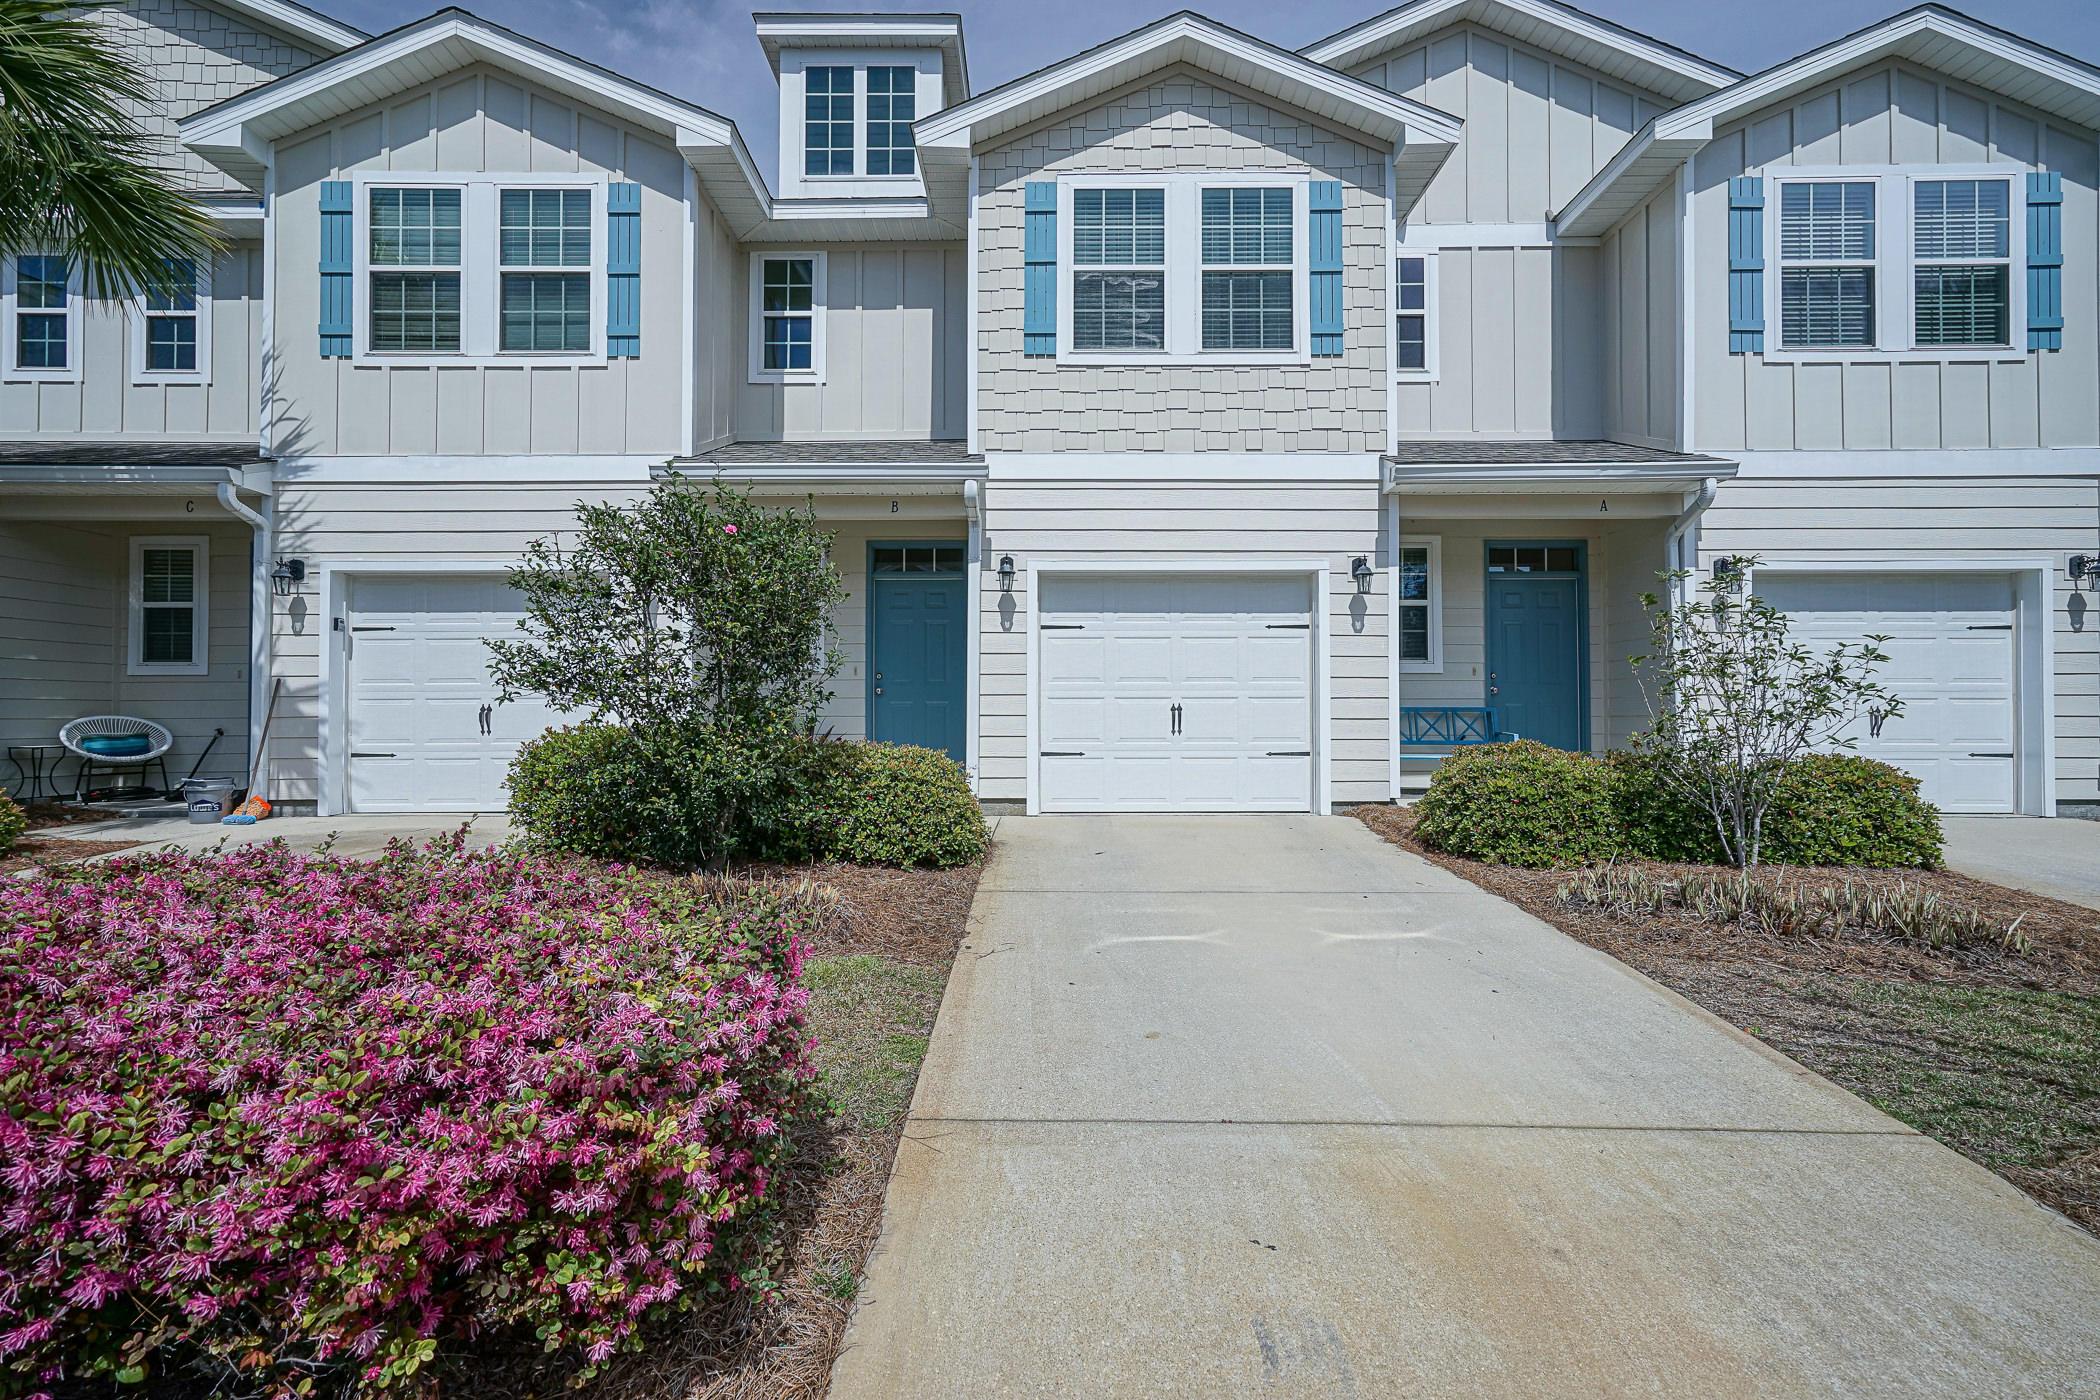 Photo of home for sale at 19 Shady Oaks, Santa Rosa Beach FL